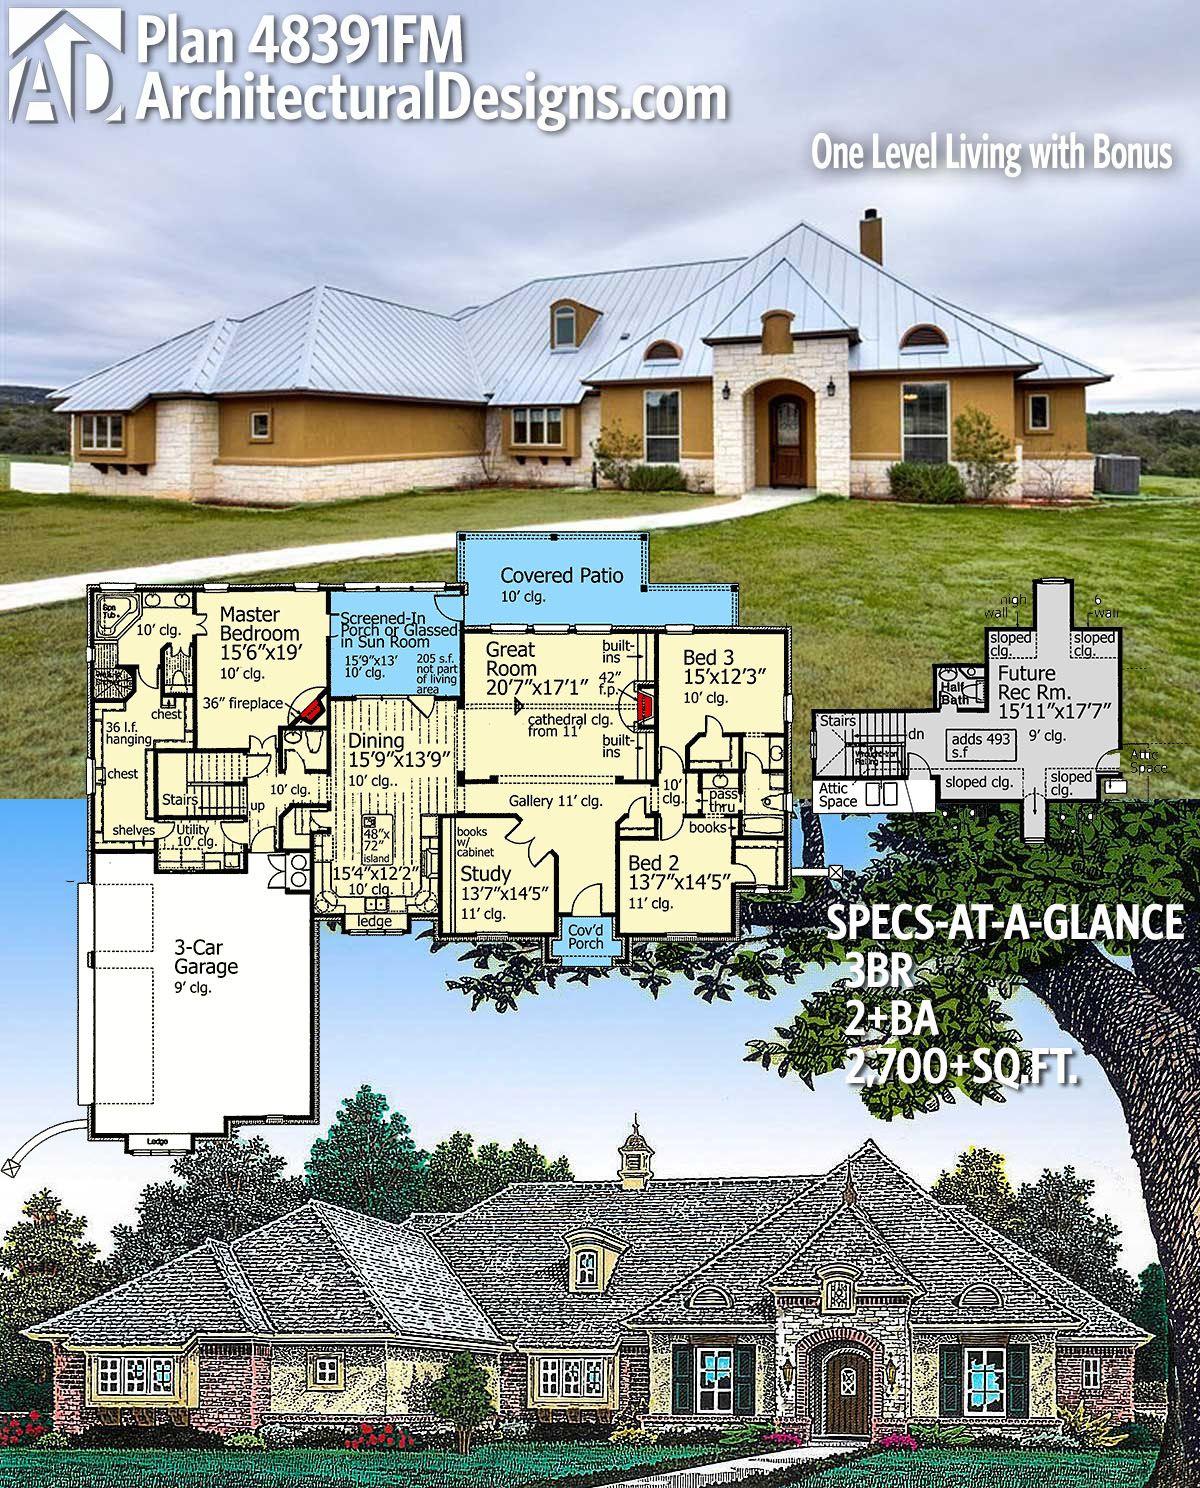 Plan 48391fm One Level Living With Bonus Fantasy House Old Abandoned Houses Dream House Plans